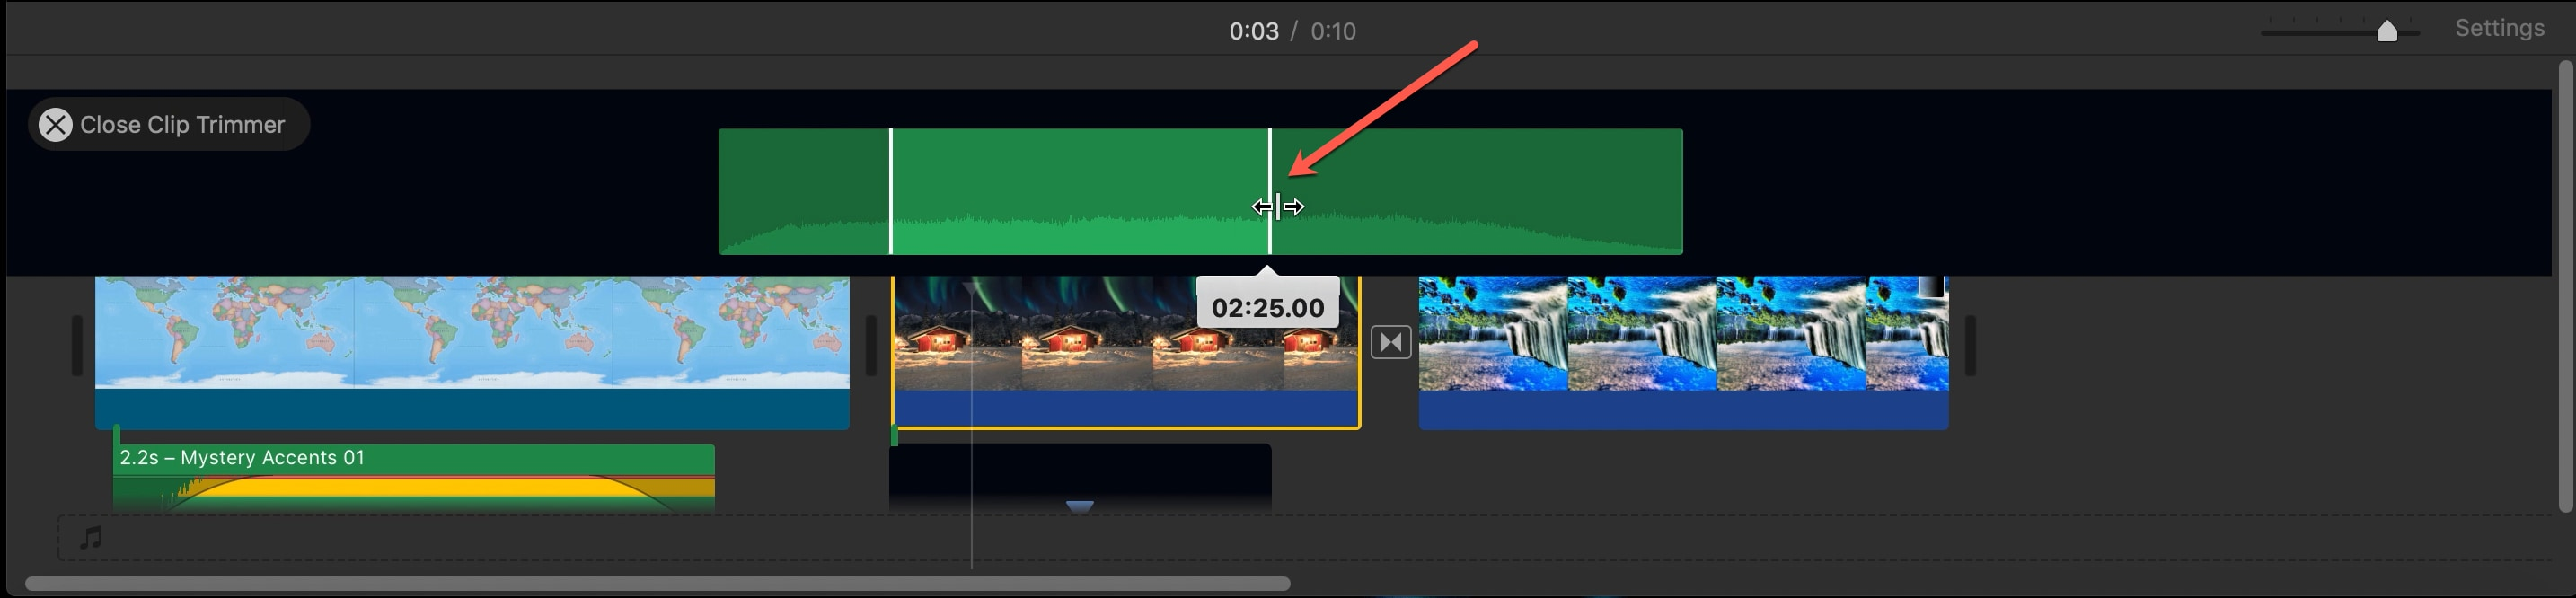 Clip Trimmer Audio Clip iMovie Mac